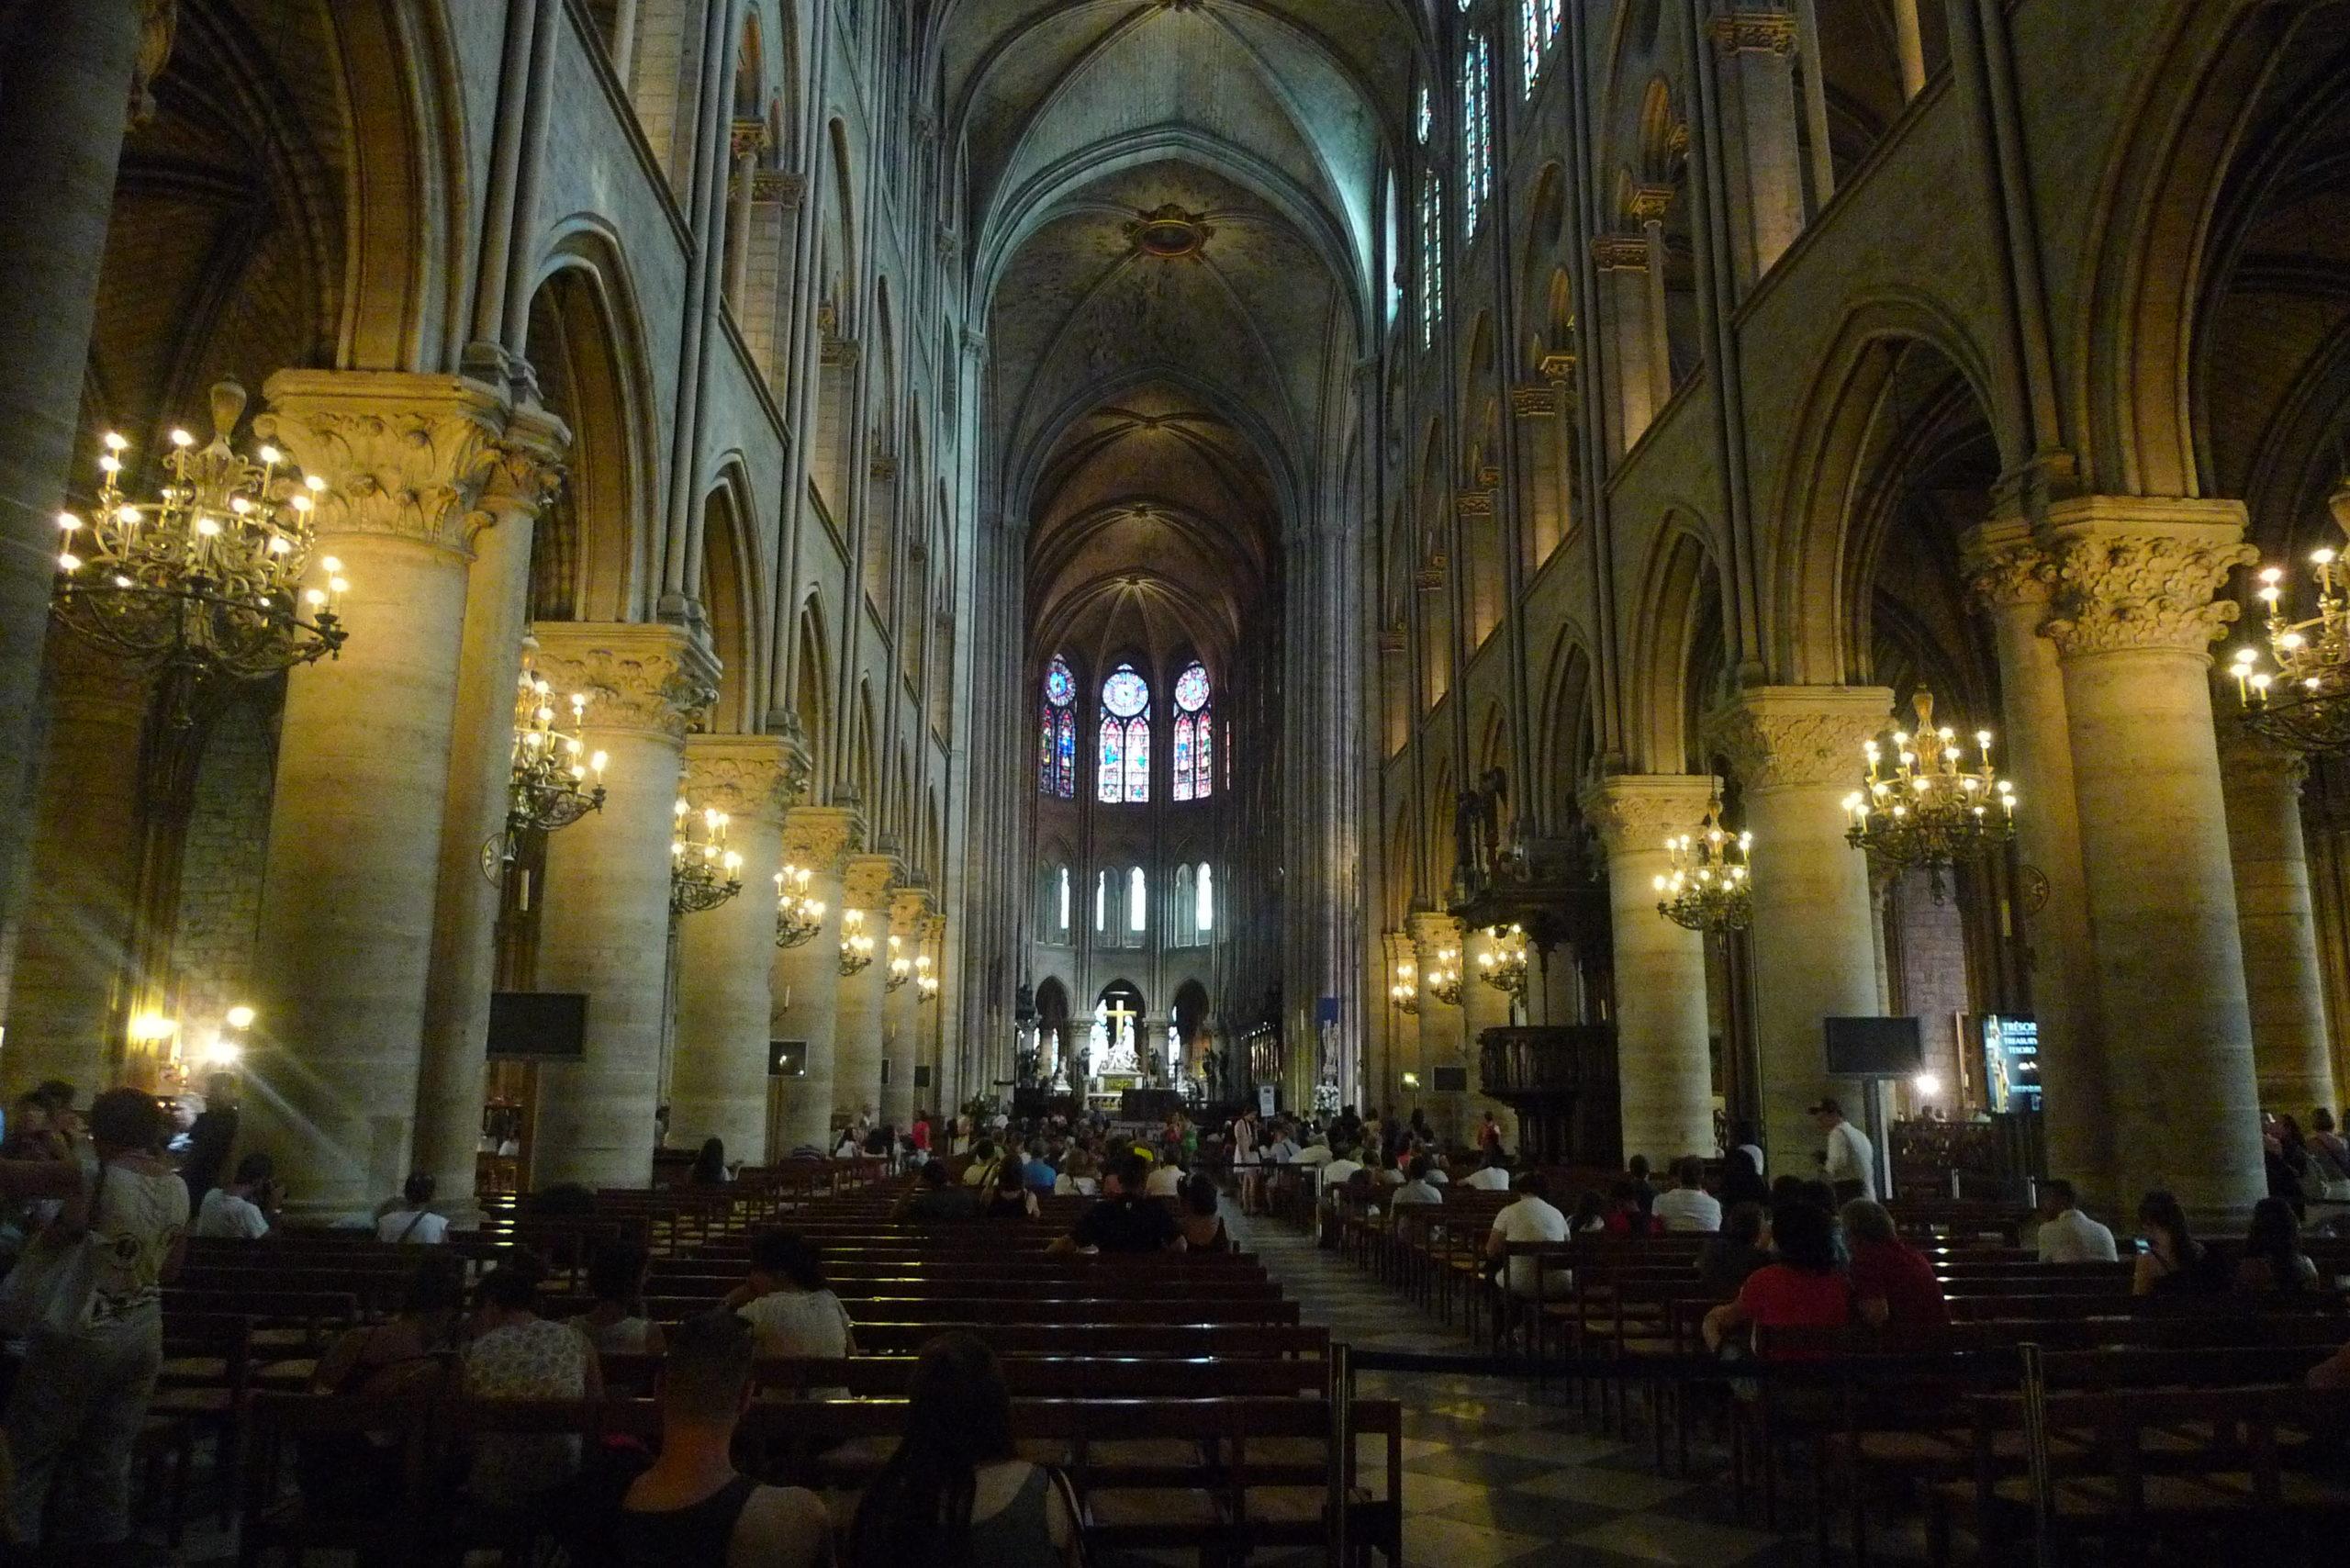 Франция, Париж, путешествия по Европе, Лувр, Собор Парижской Богоматери, Хэмингуэй